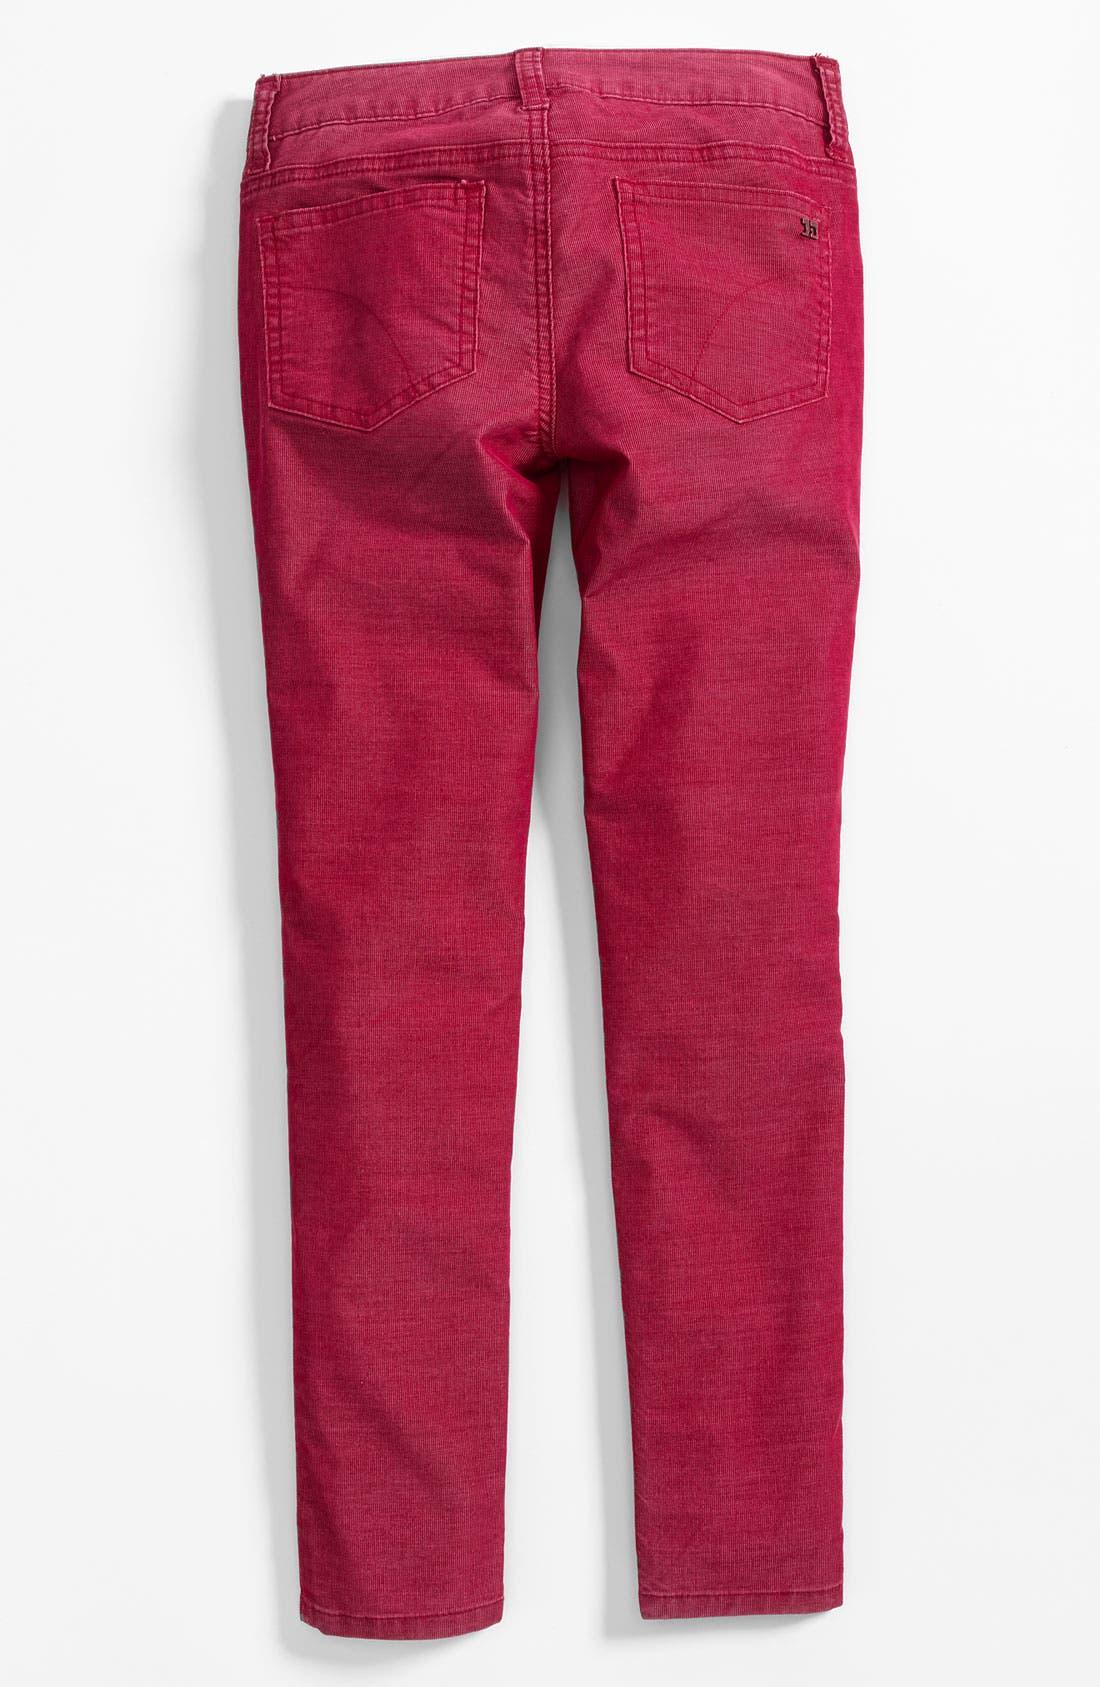 Alternate Image 1 Selected - Joe's Corduroy Leggings (Big Girls)